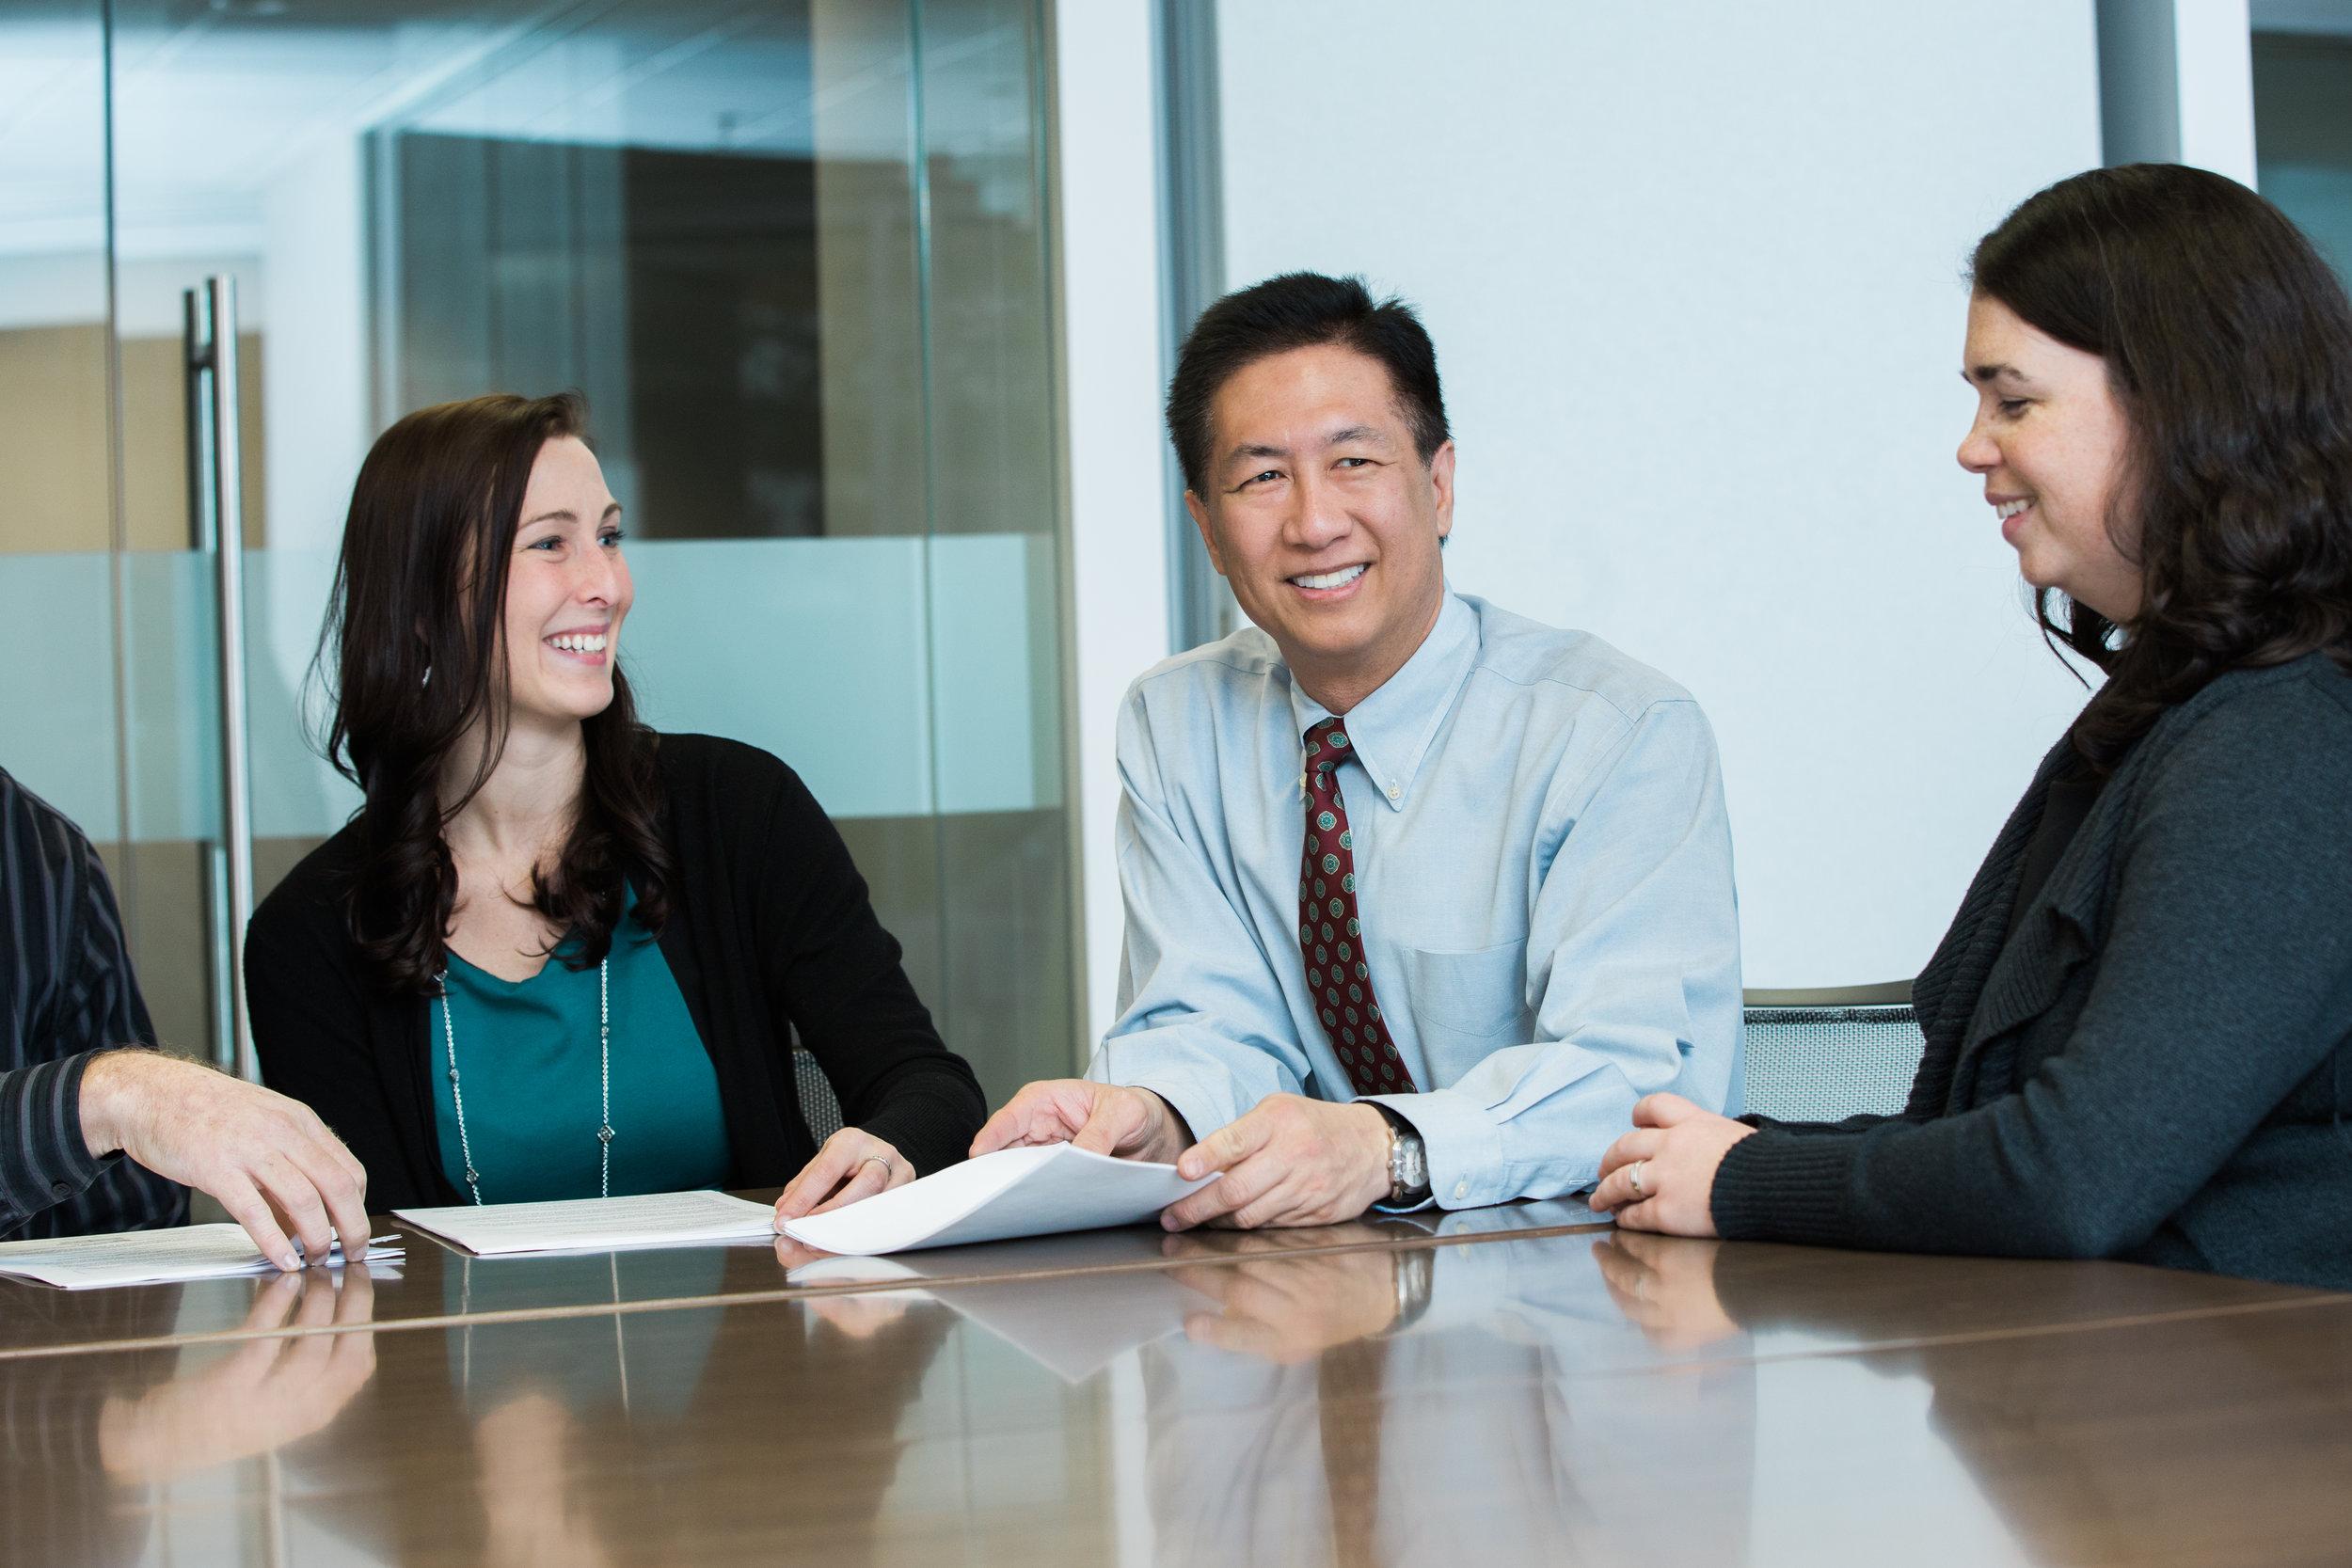 Pictured Above: Hope Cichra, Senior Paralegal; Duke W. Yee, President/Owner; Kelly Sullivan, Associate Attorney